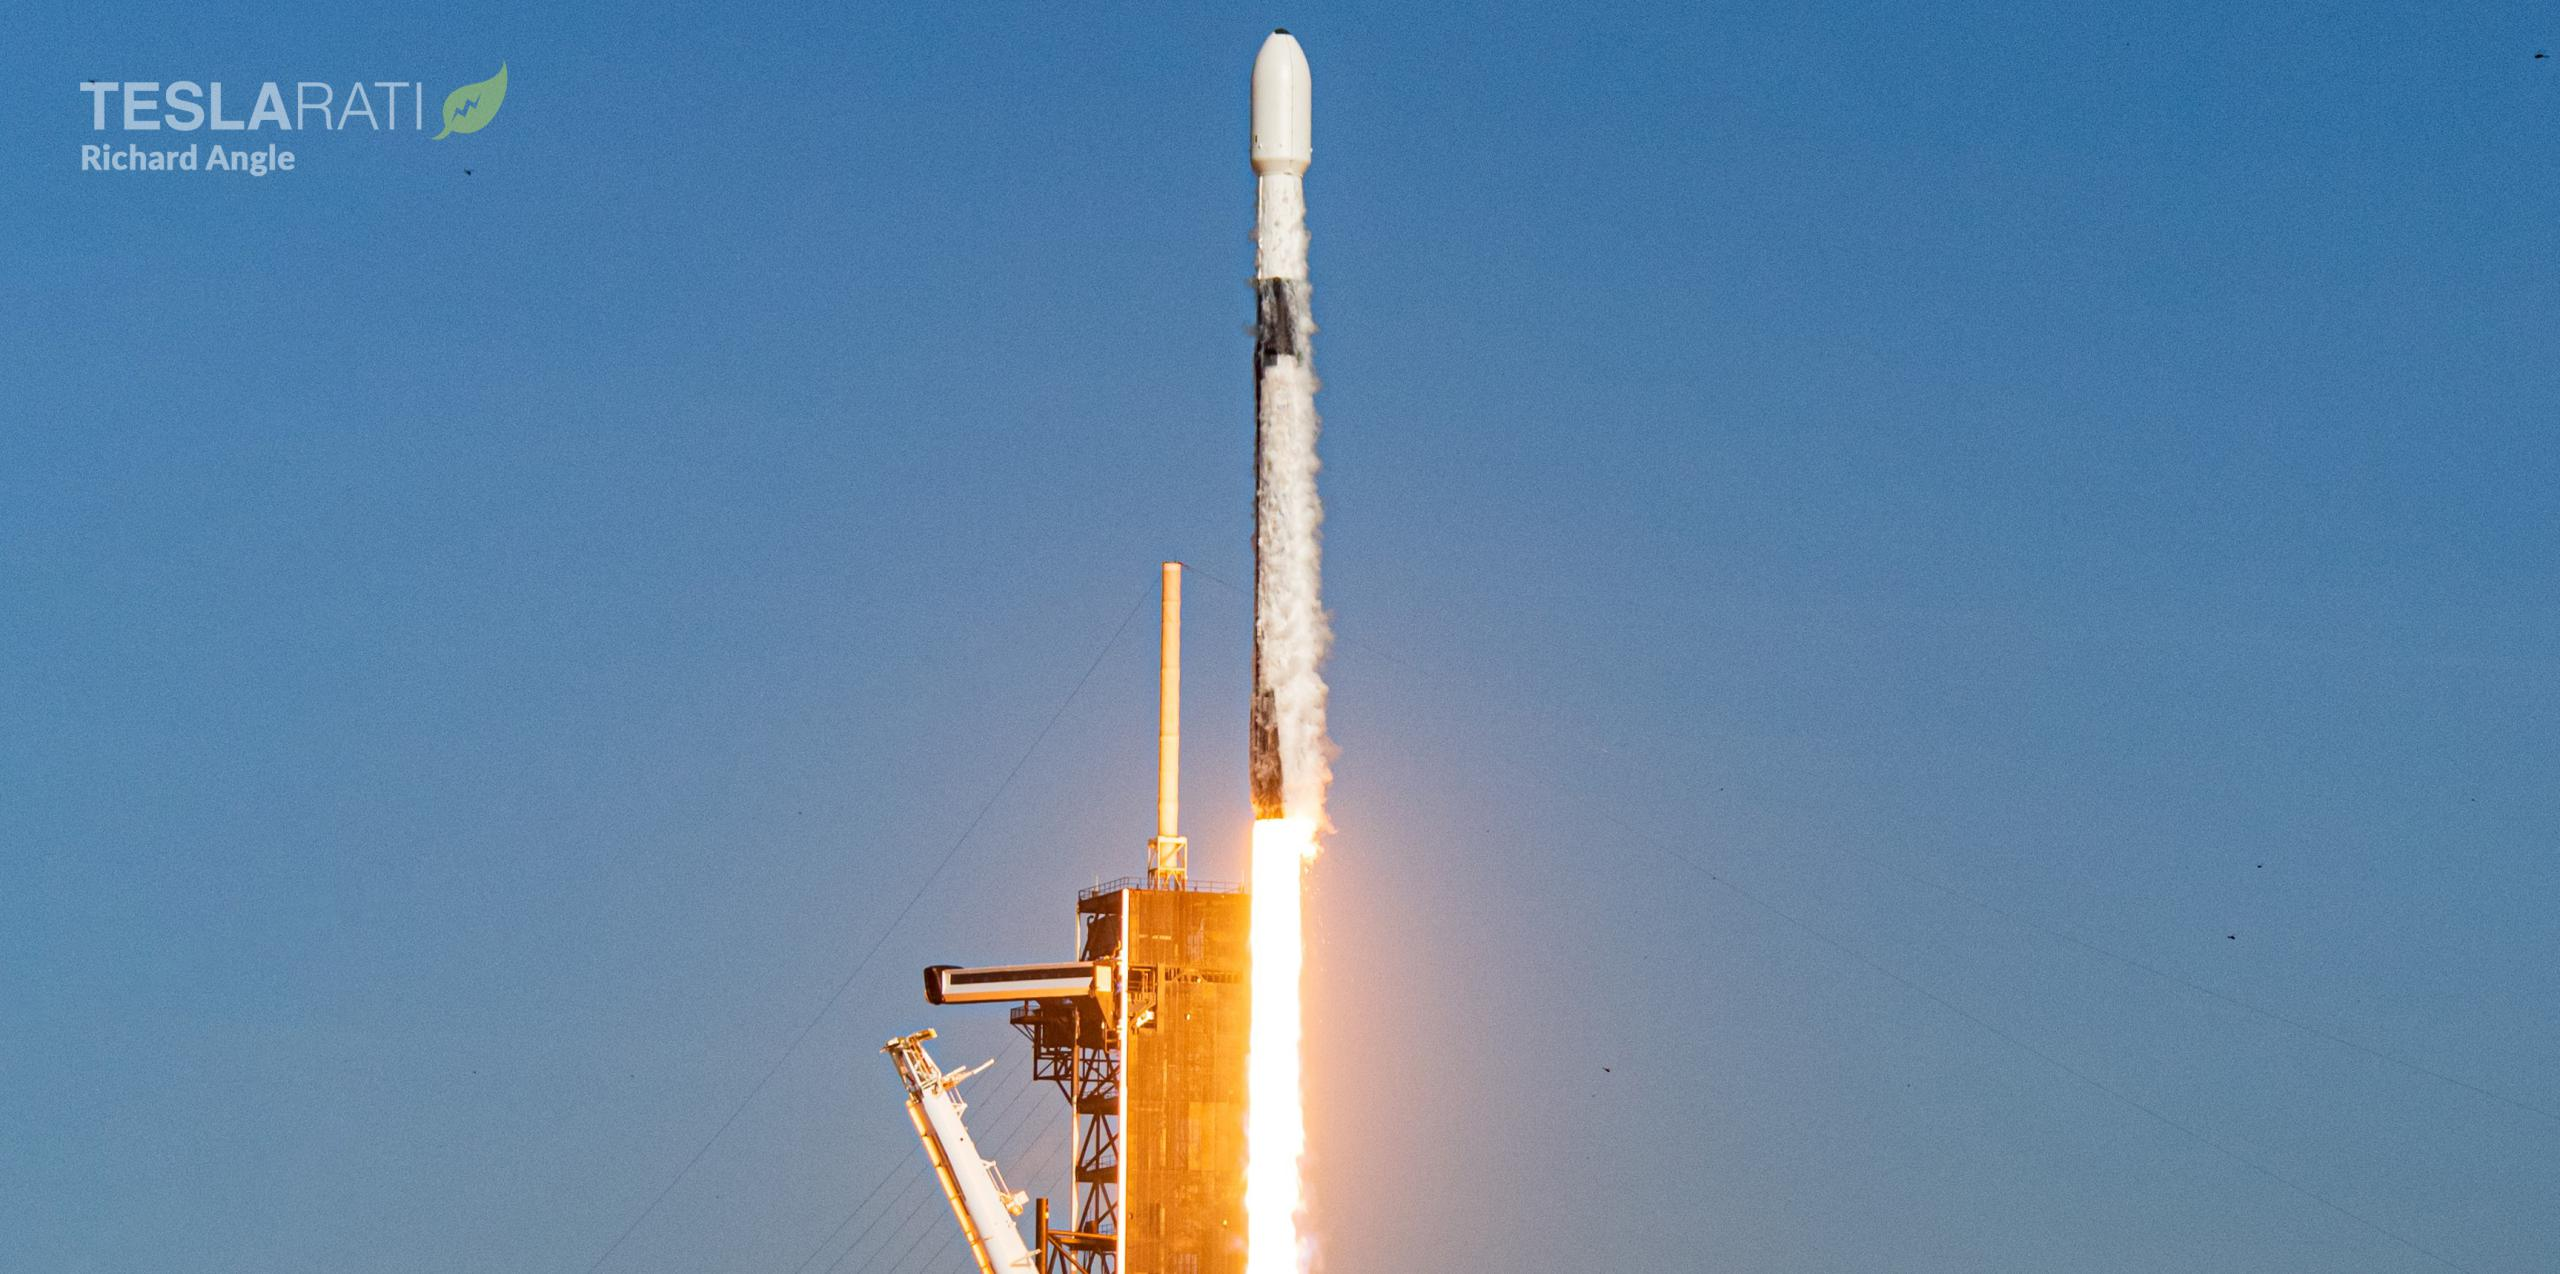 Starlink-11 Falcon 9 B1060 LC-39A 090320 (Richard Angle) launch 6 crop 2 (c)